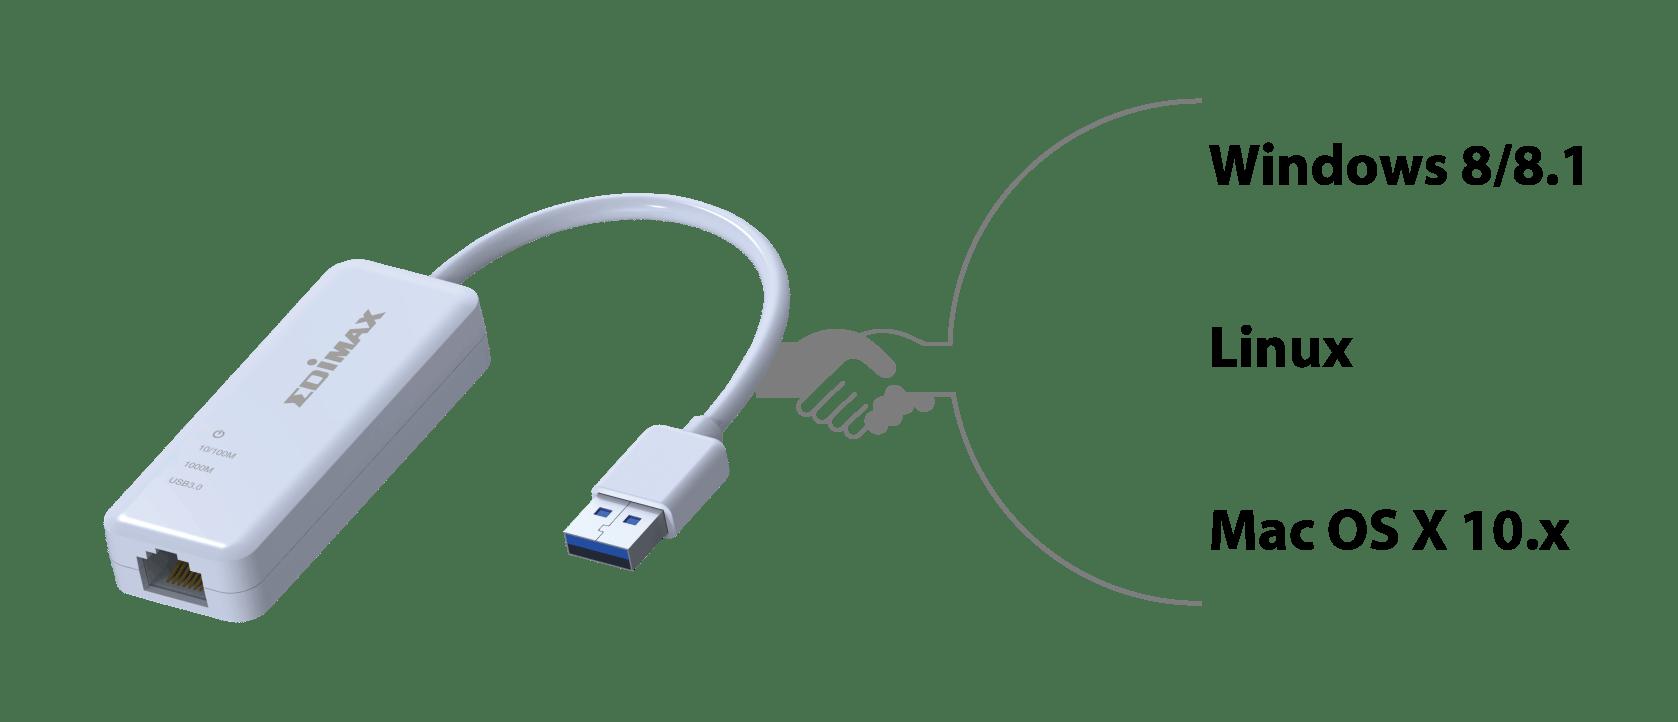 hight resolution of edimax usb3 0 gigabit ethernet adapter eu 4306 compatible win8 1 linux mac10 png